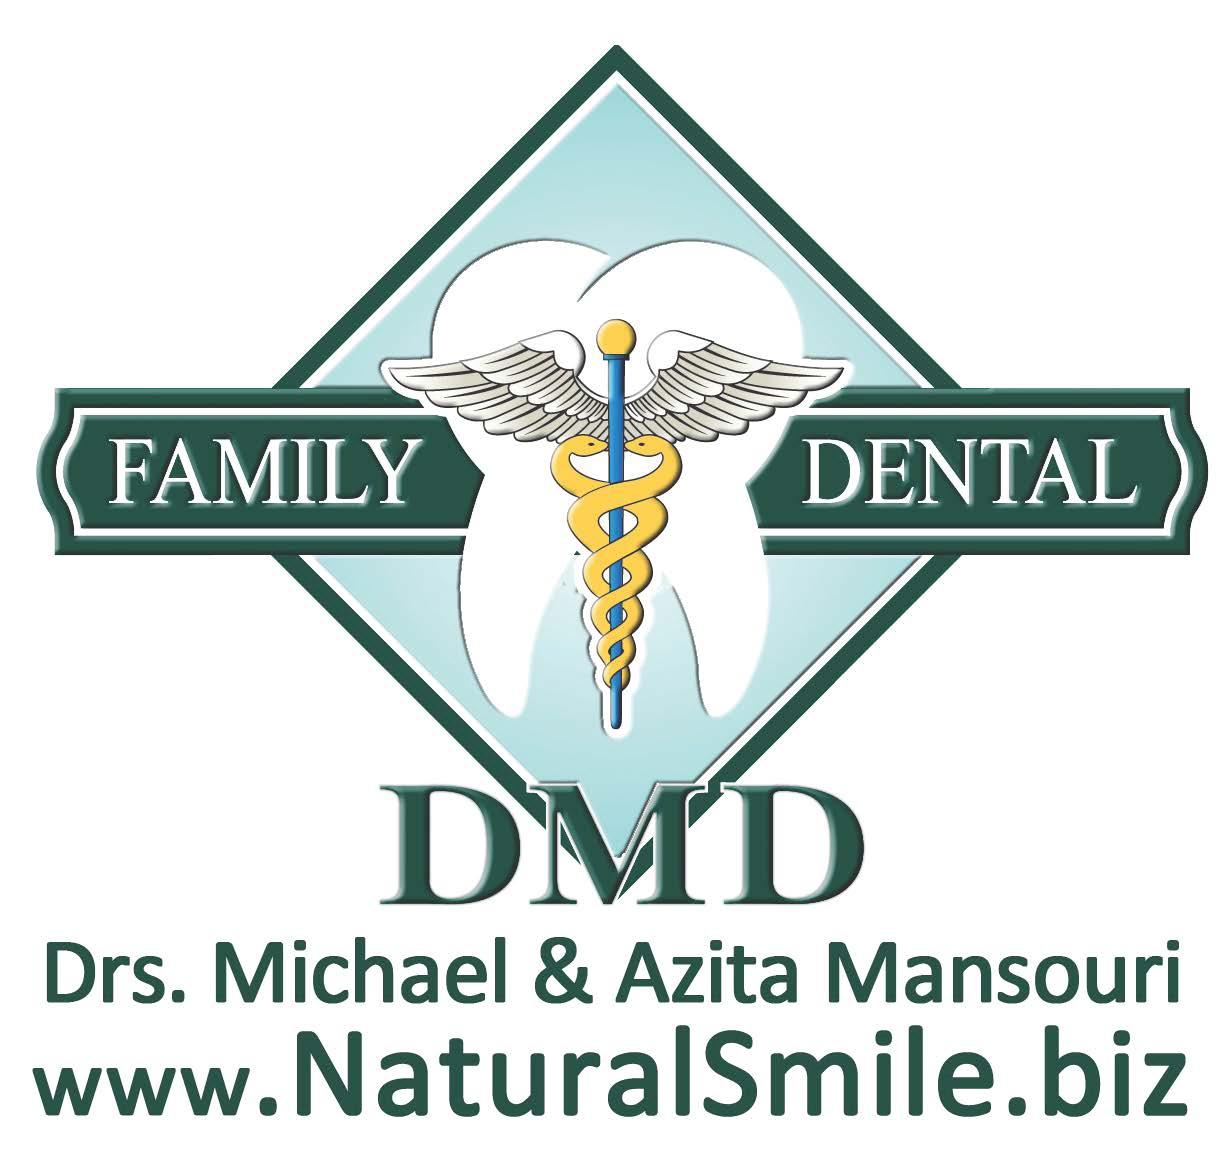 Dr. Michael & Azita Mansouri